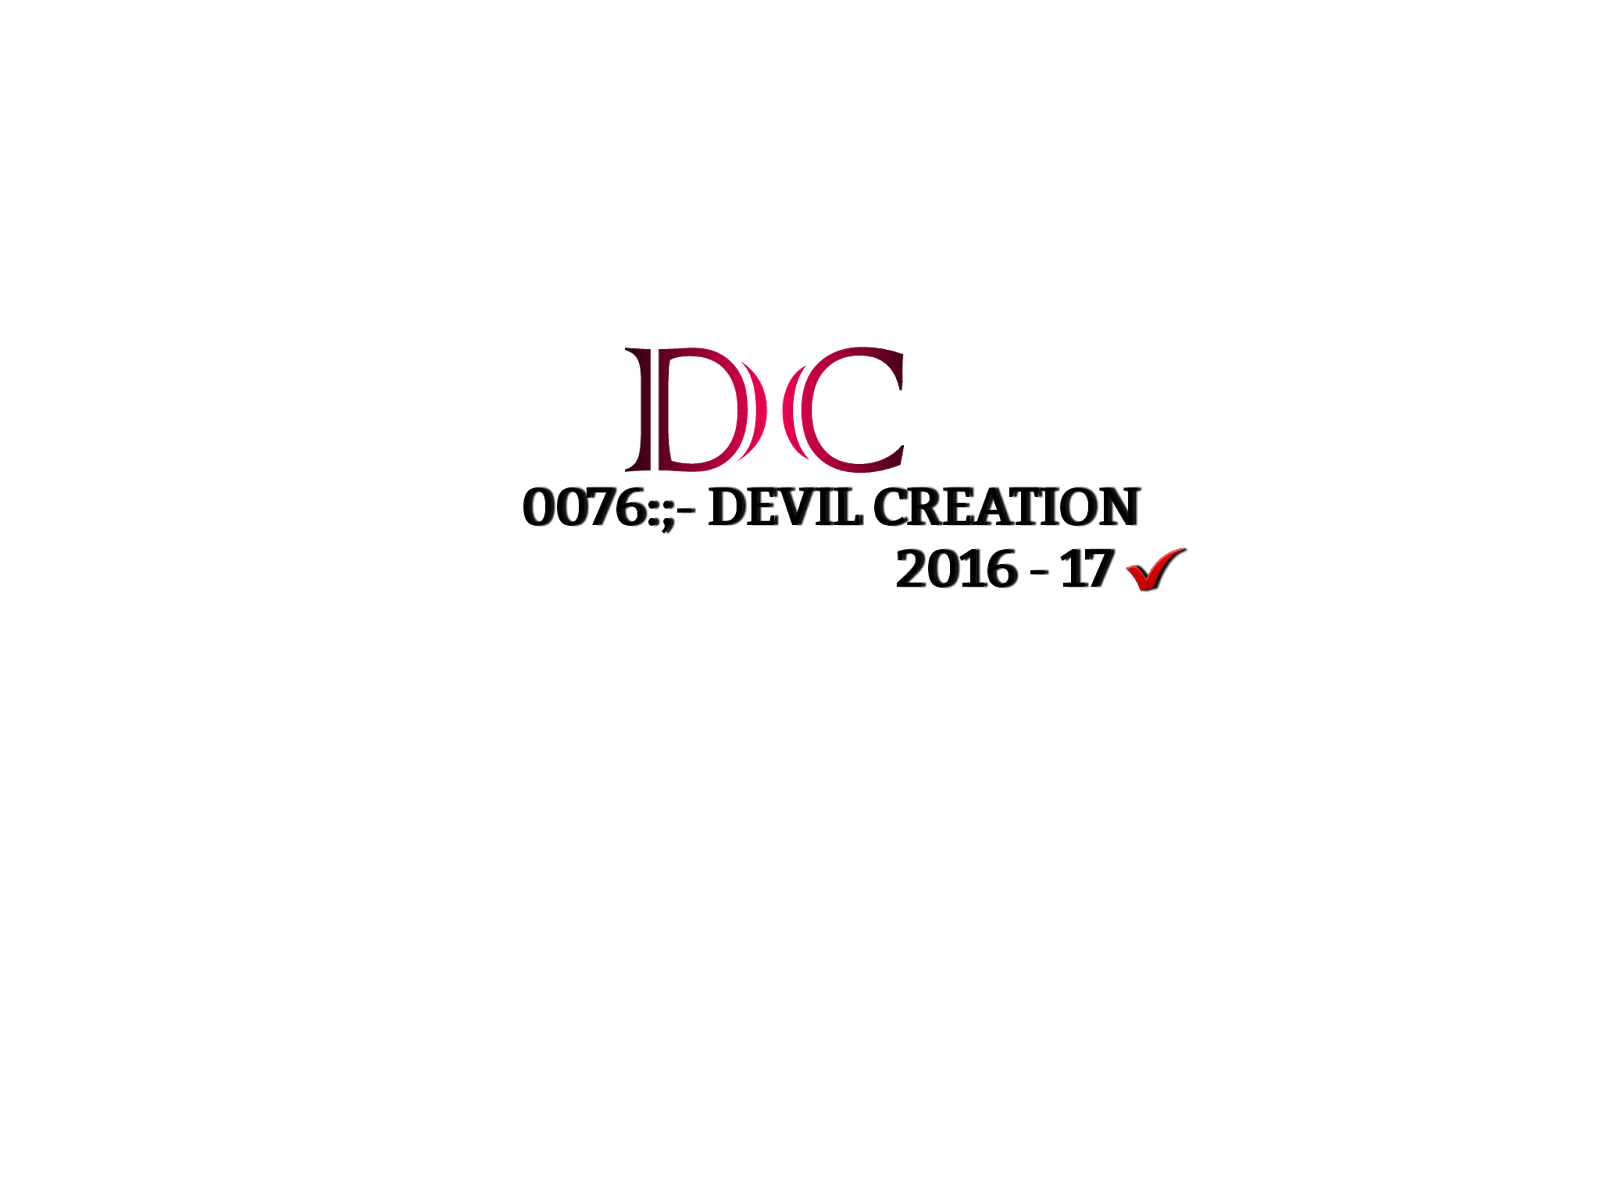 Prince editx devil bhai logo utha le devil bhai logo utha le voltagebd Gallery